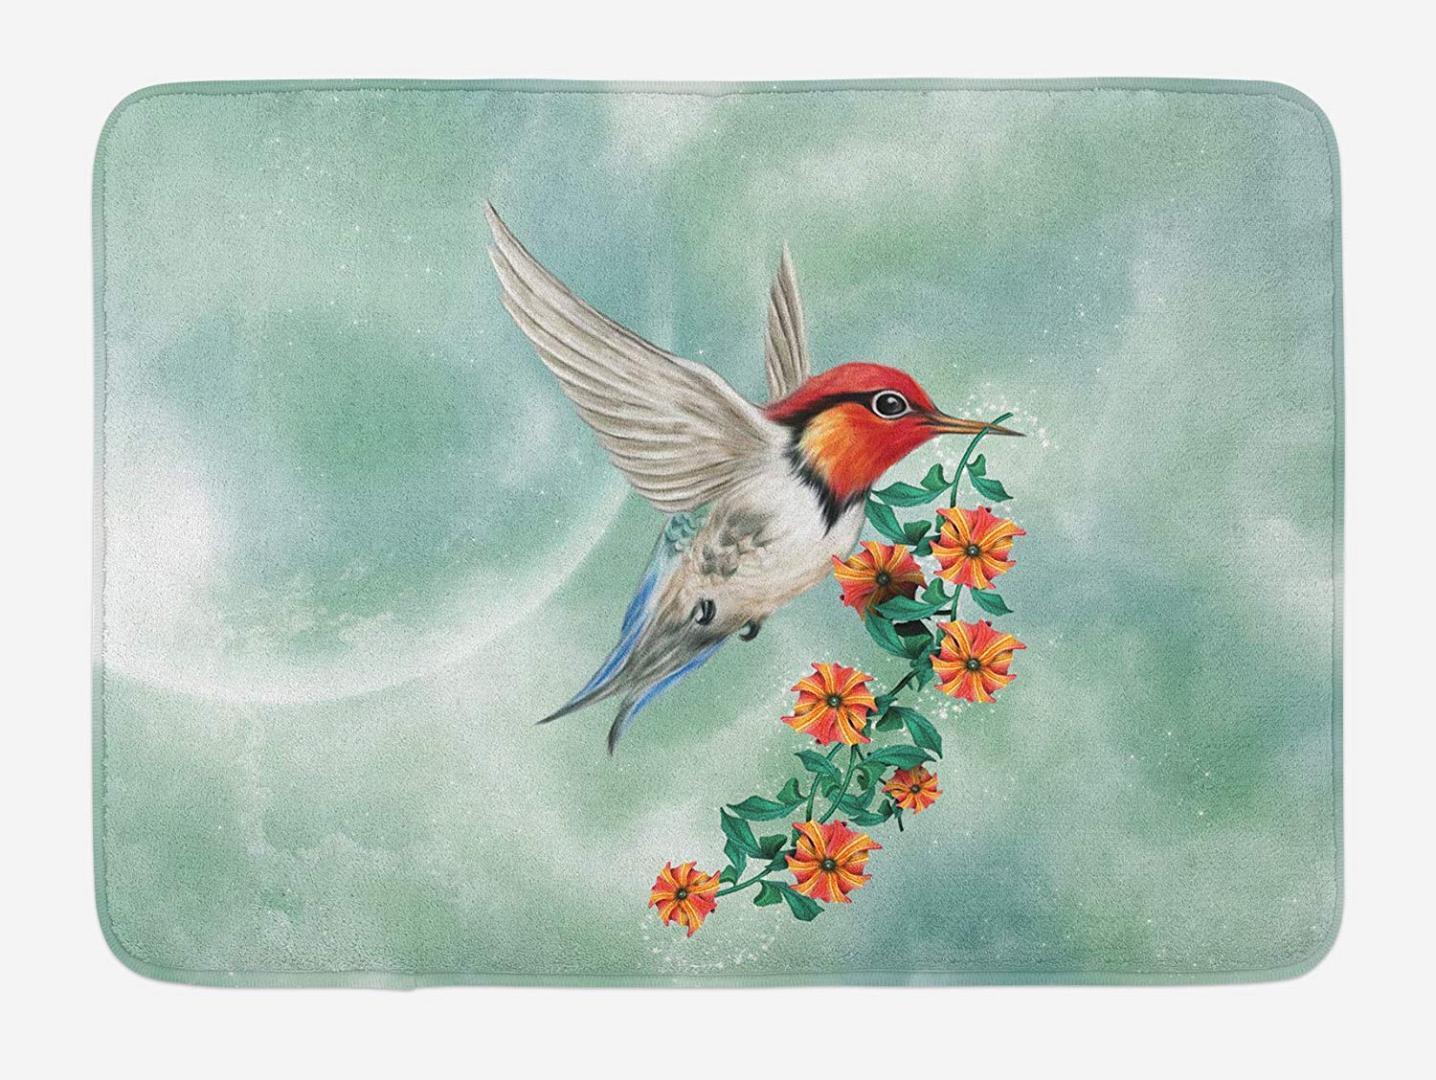 Hummingbird Doormat Hummingbird 꽃이 만발한 지점으로 날고있다 꽃 자연 일러스트레이션 홈 인테리어 도어 바닥 매트 매트